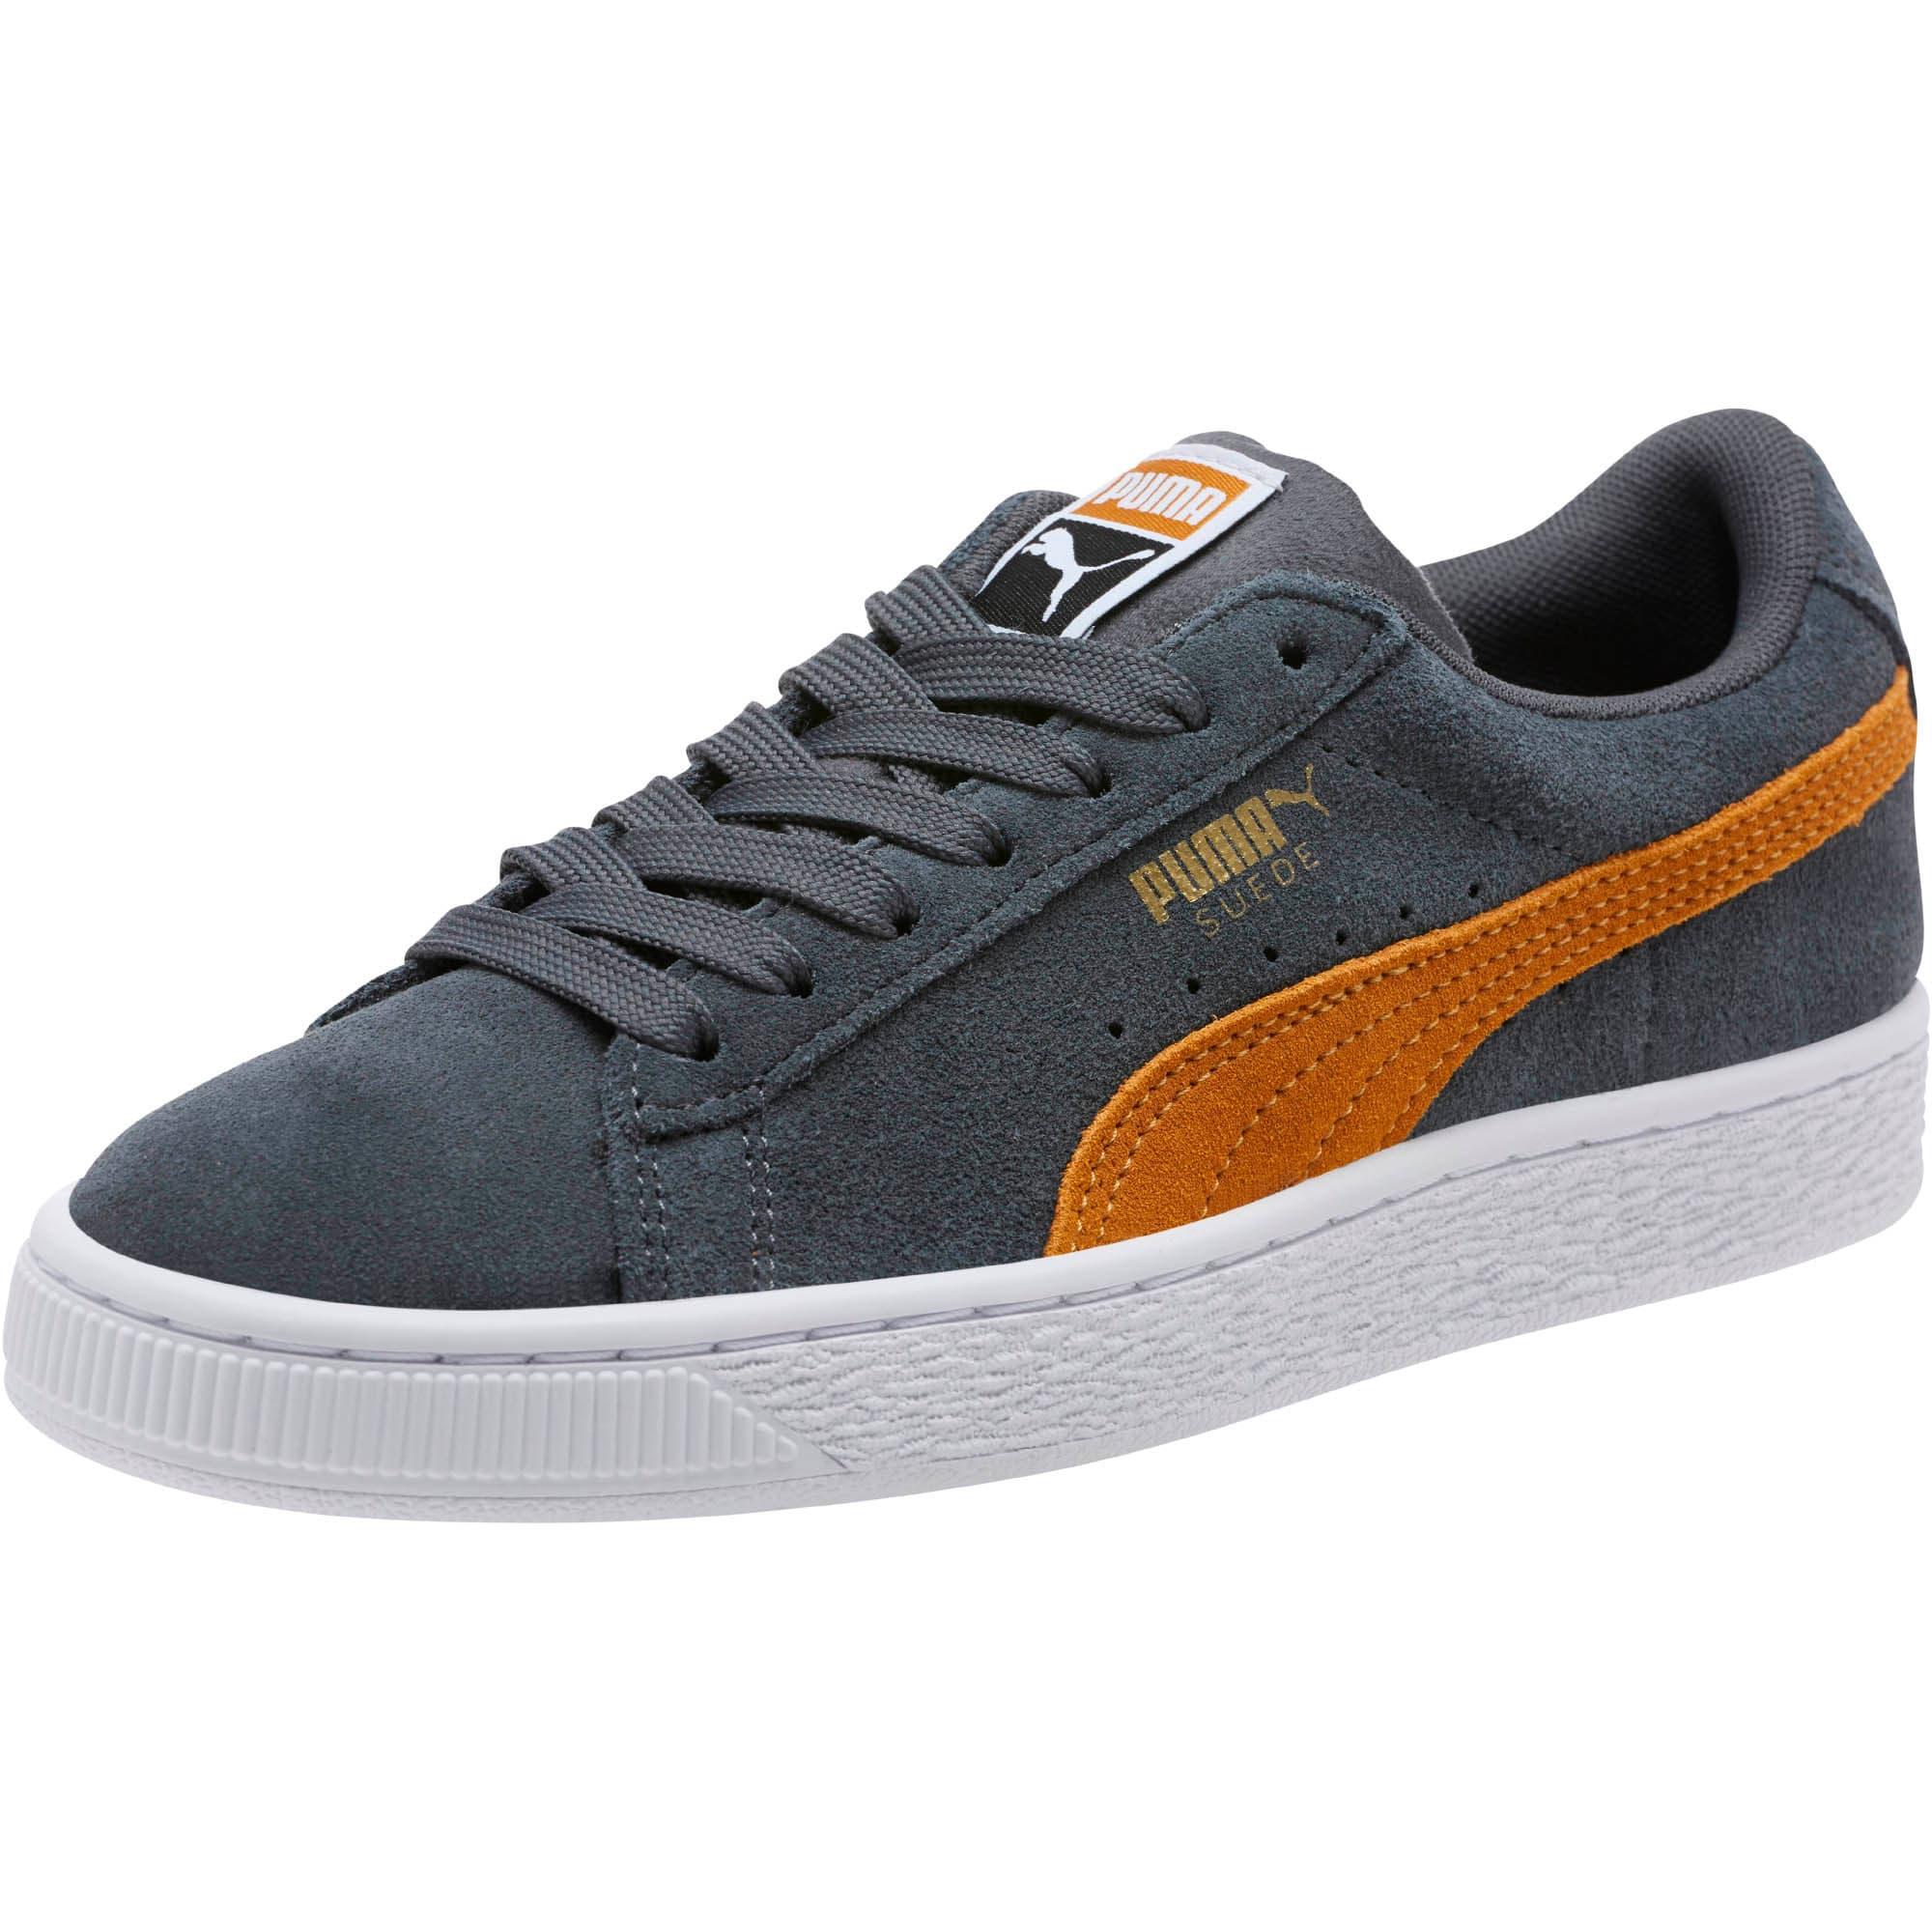 Thumbnail 1 of Suede Classic Sneakers JR, Iron Gate-Buckthorn, medium